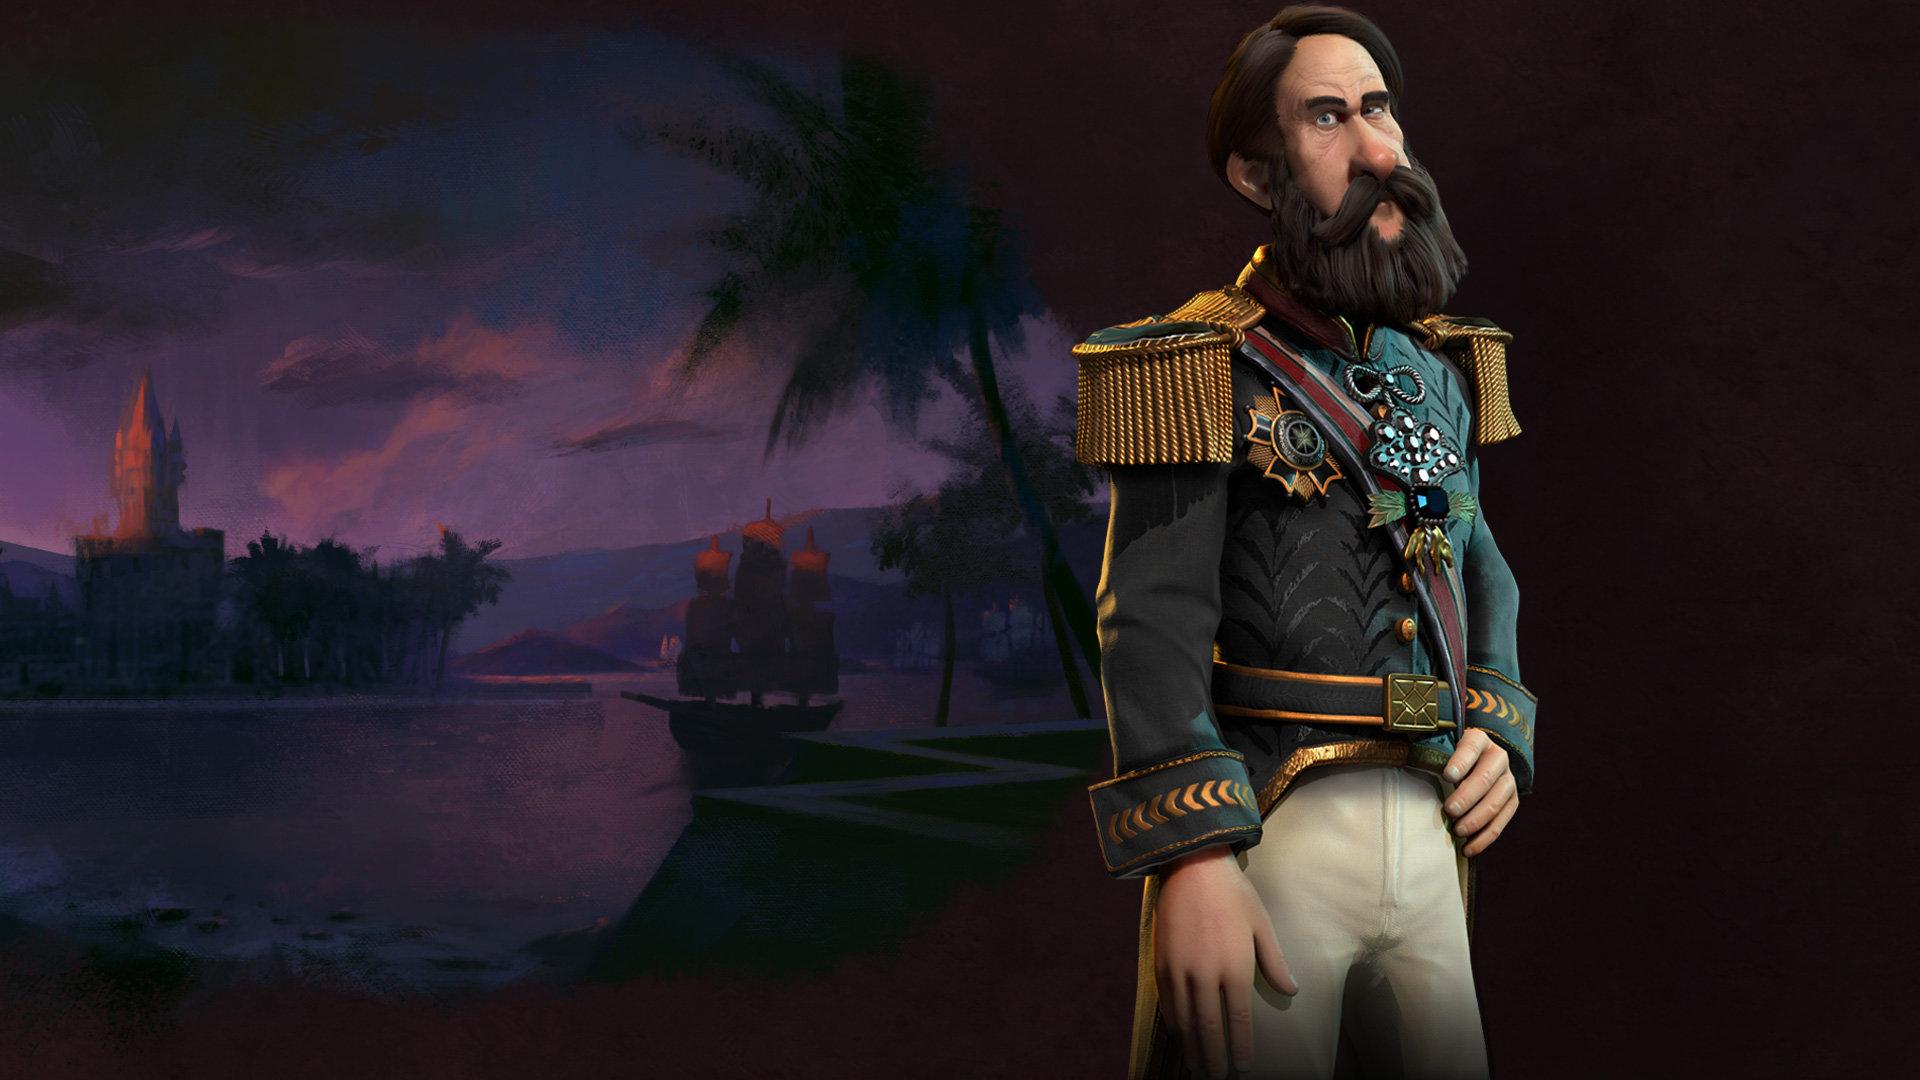 Civilization Video Game Wallpapers HD For Desktop Backgrounds